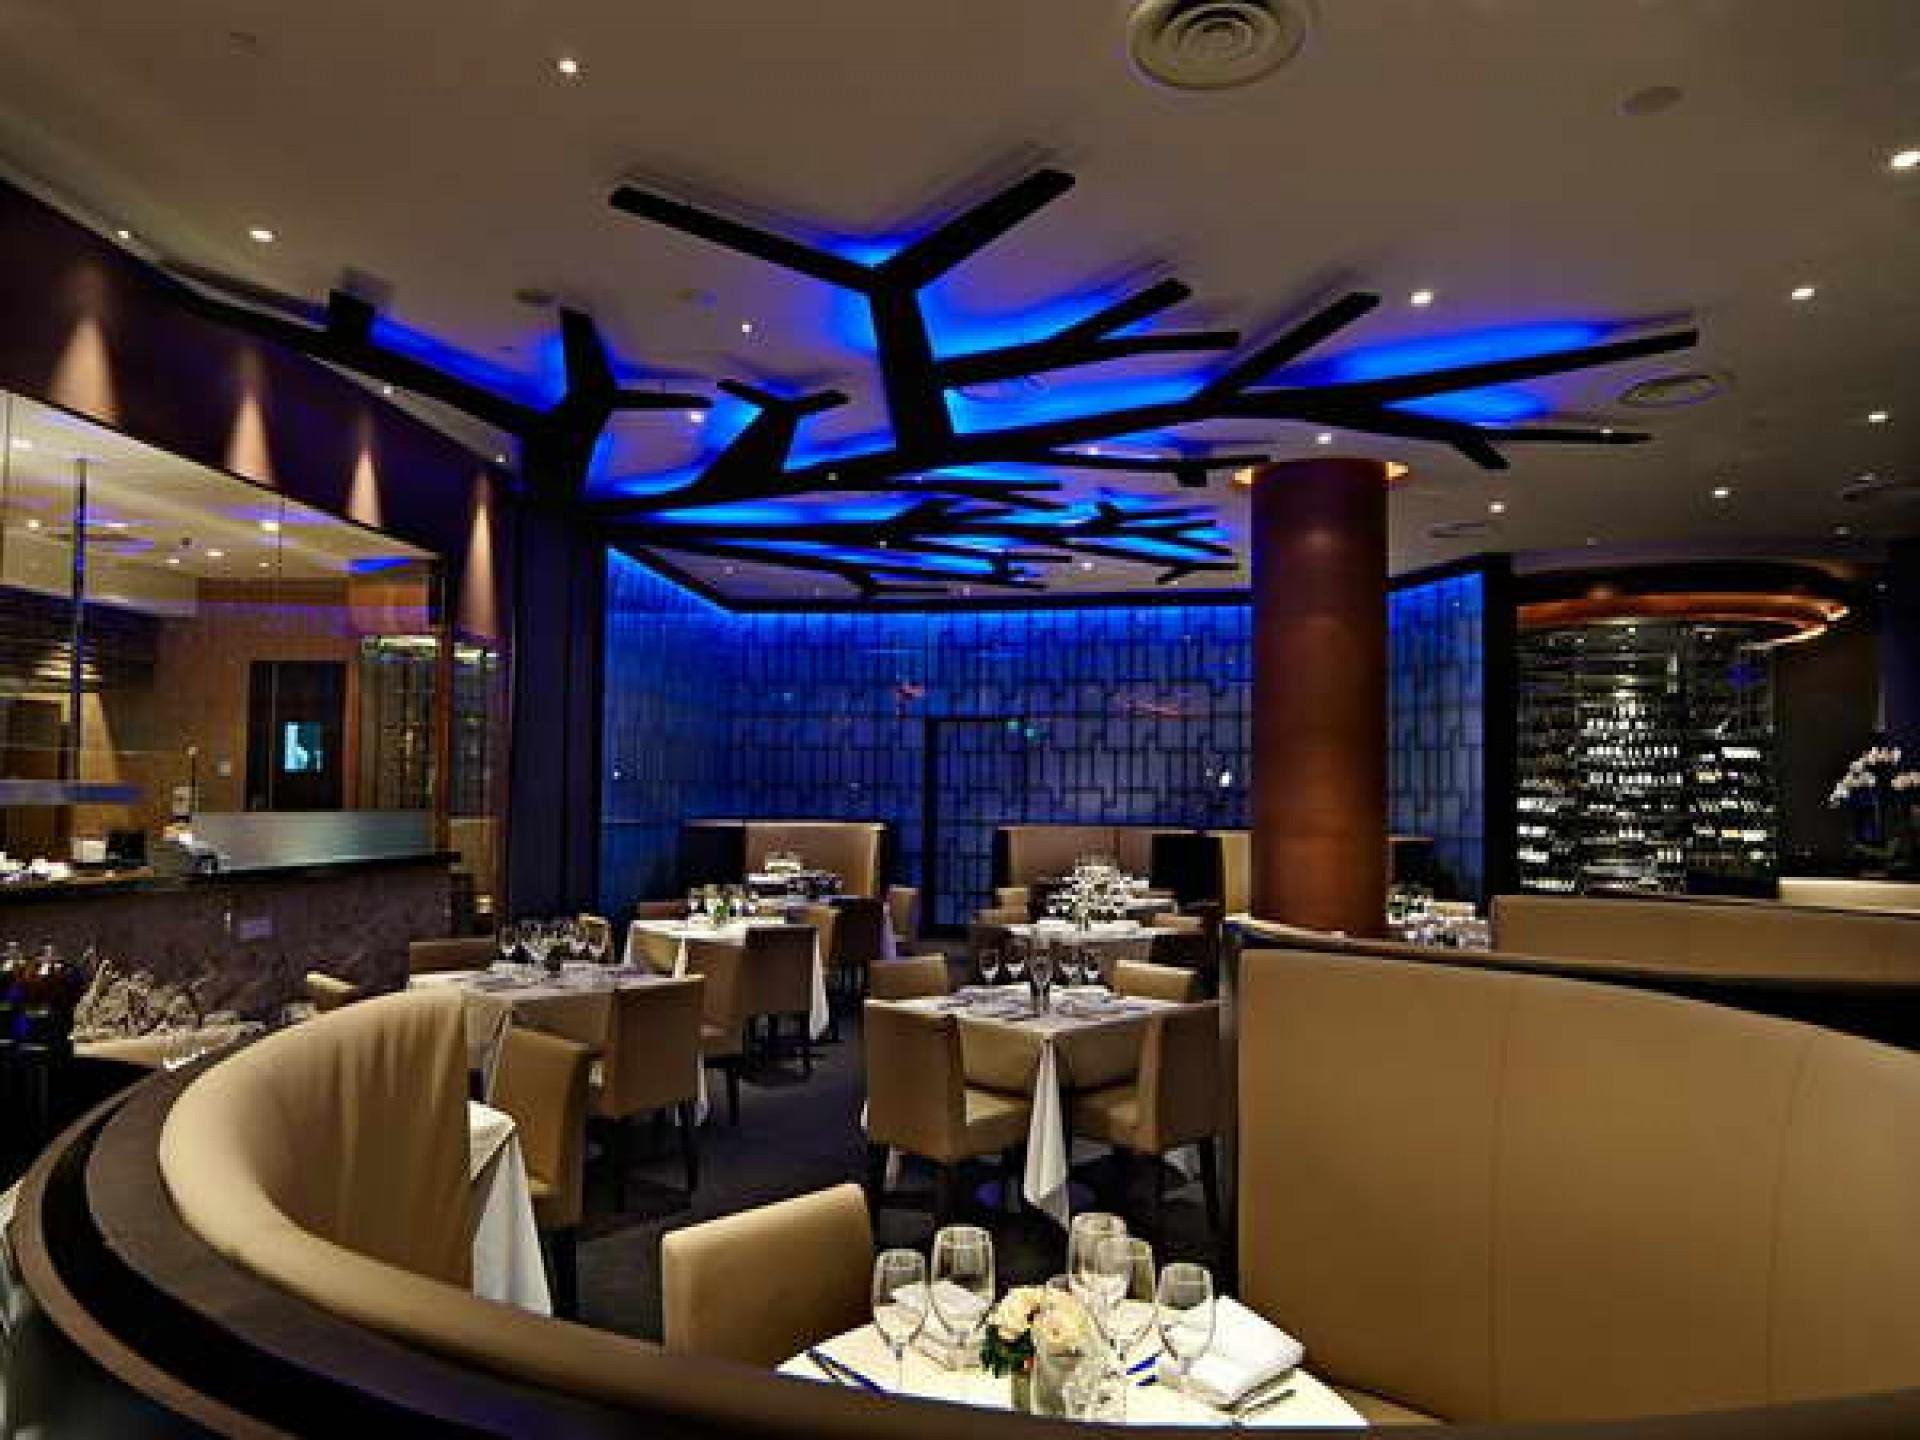 Free photo restaurant lighting concept object restaurant